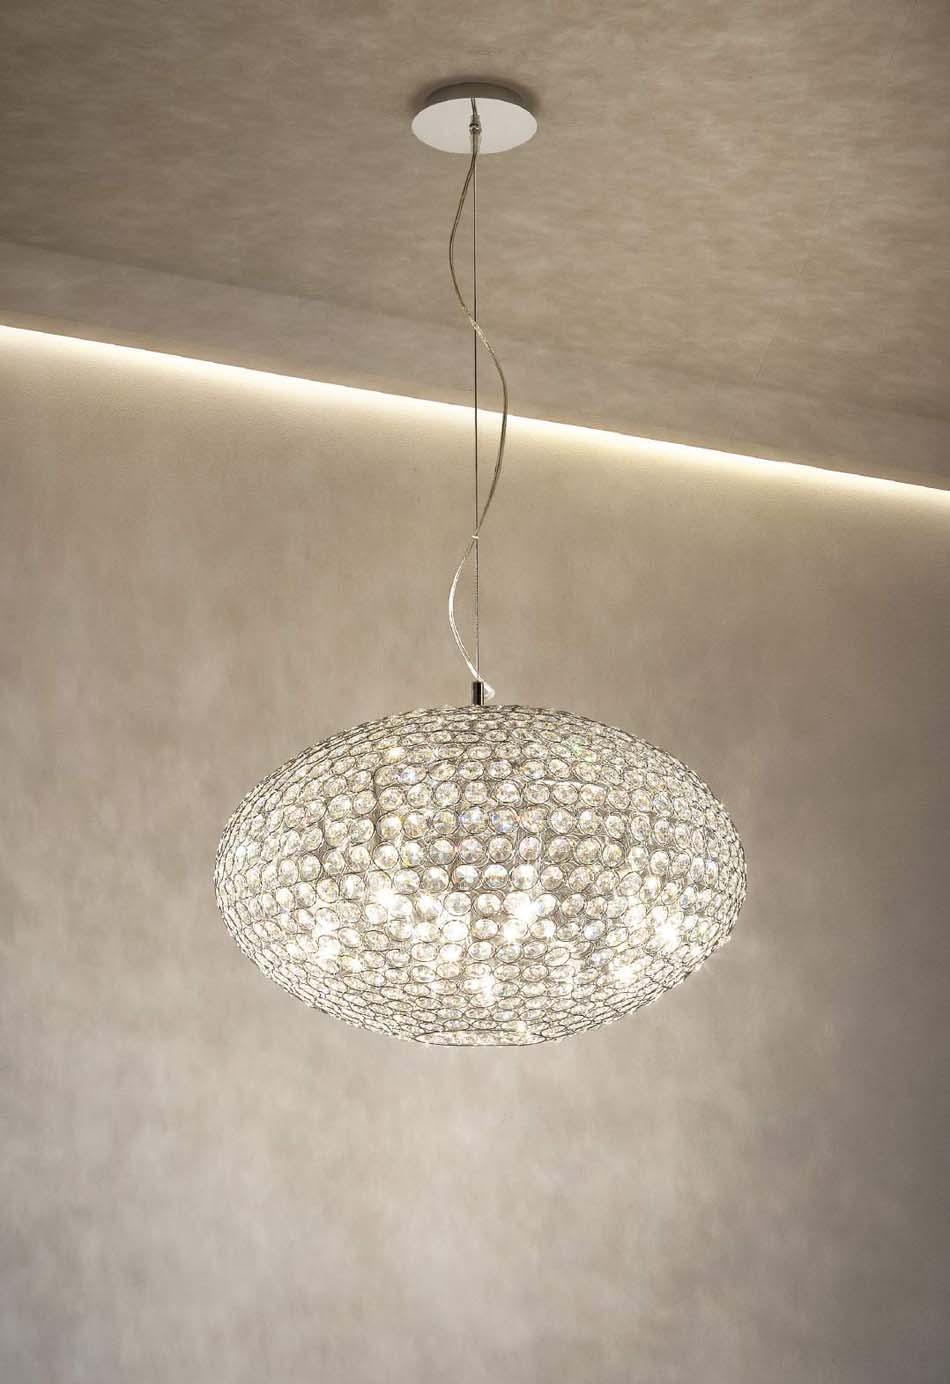 Lampade sospensione Ideal Lux Orion – Bruni Arredamenti